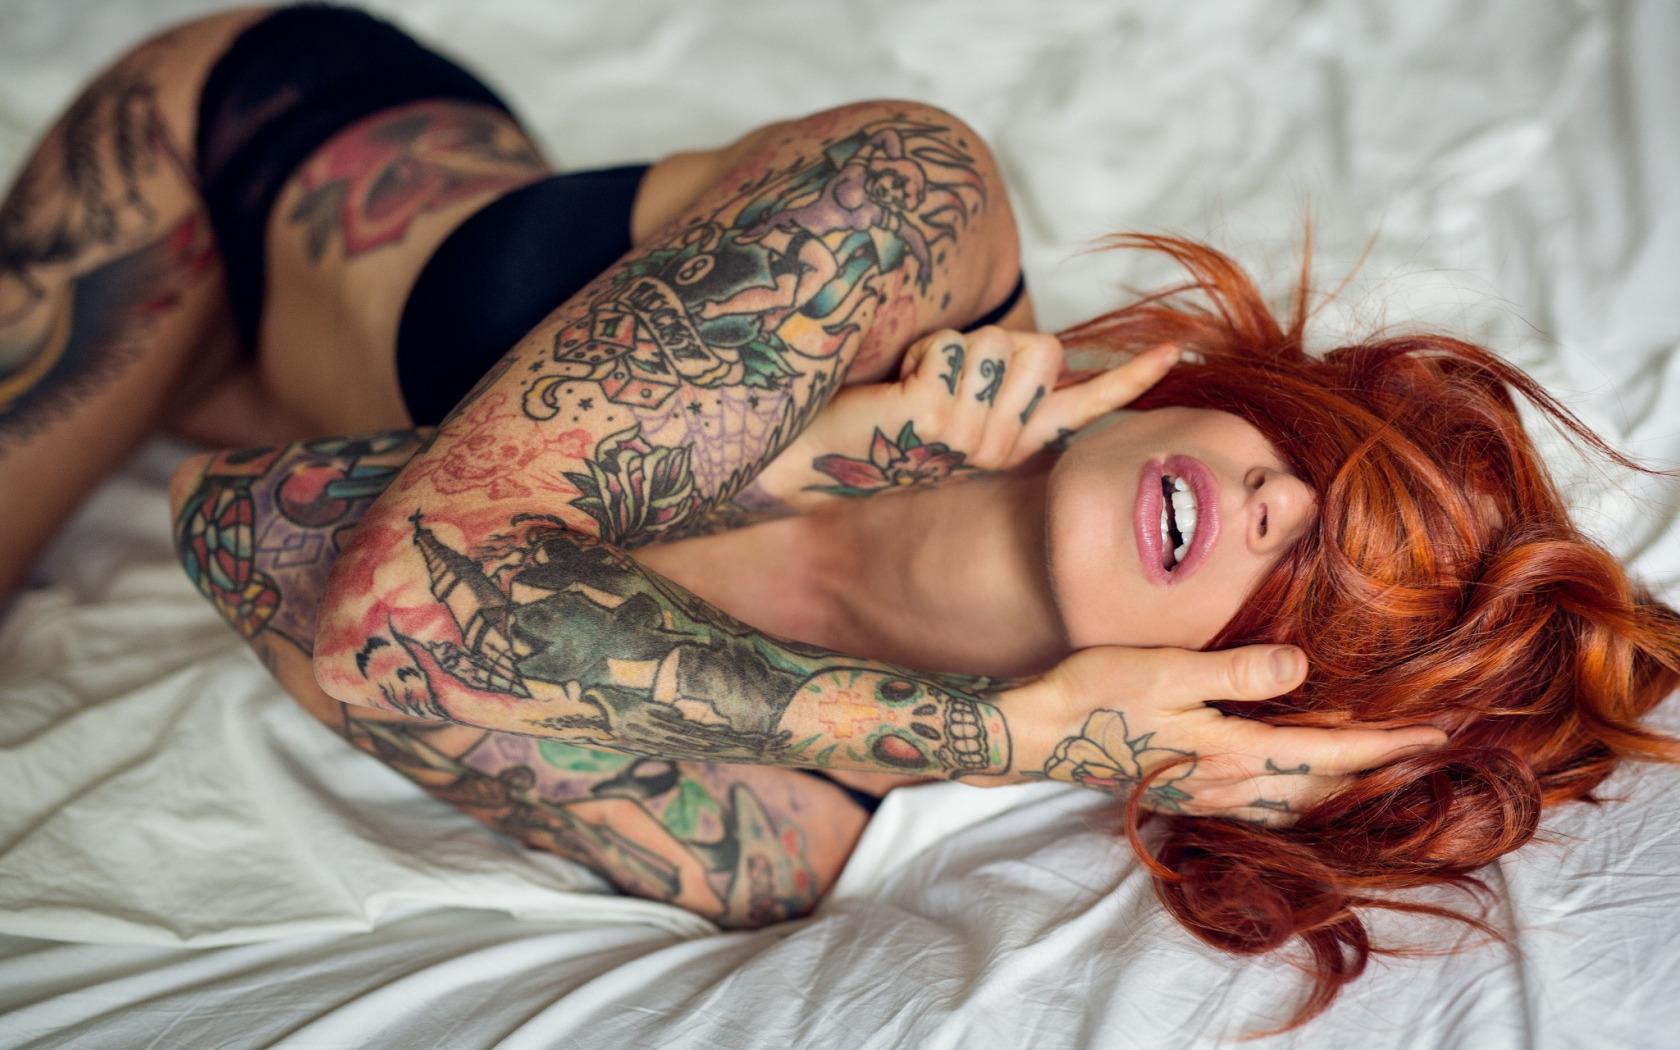 https://img2.goodfon.ru/original/1680x1050/d/f2/girl-devushka-ryzhaya-redhead-6483.jpg